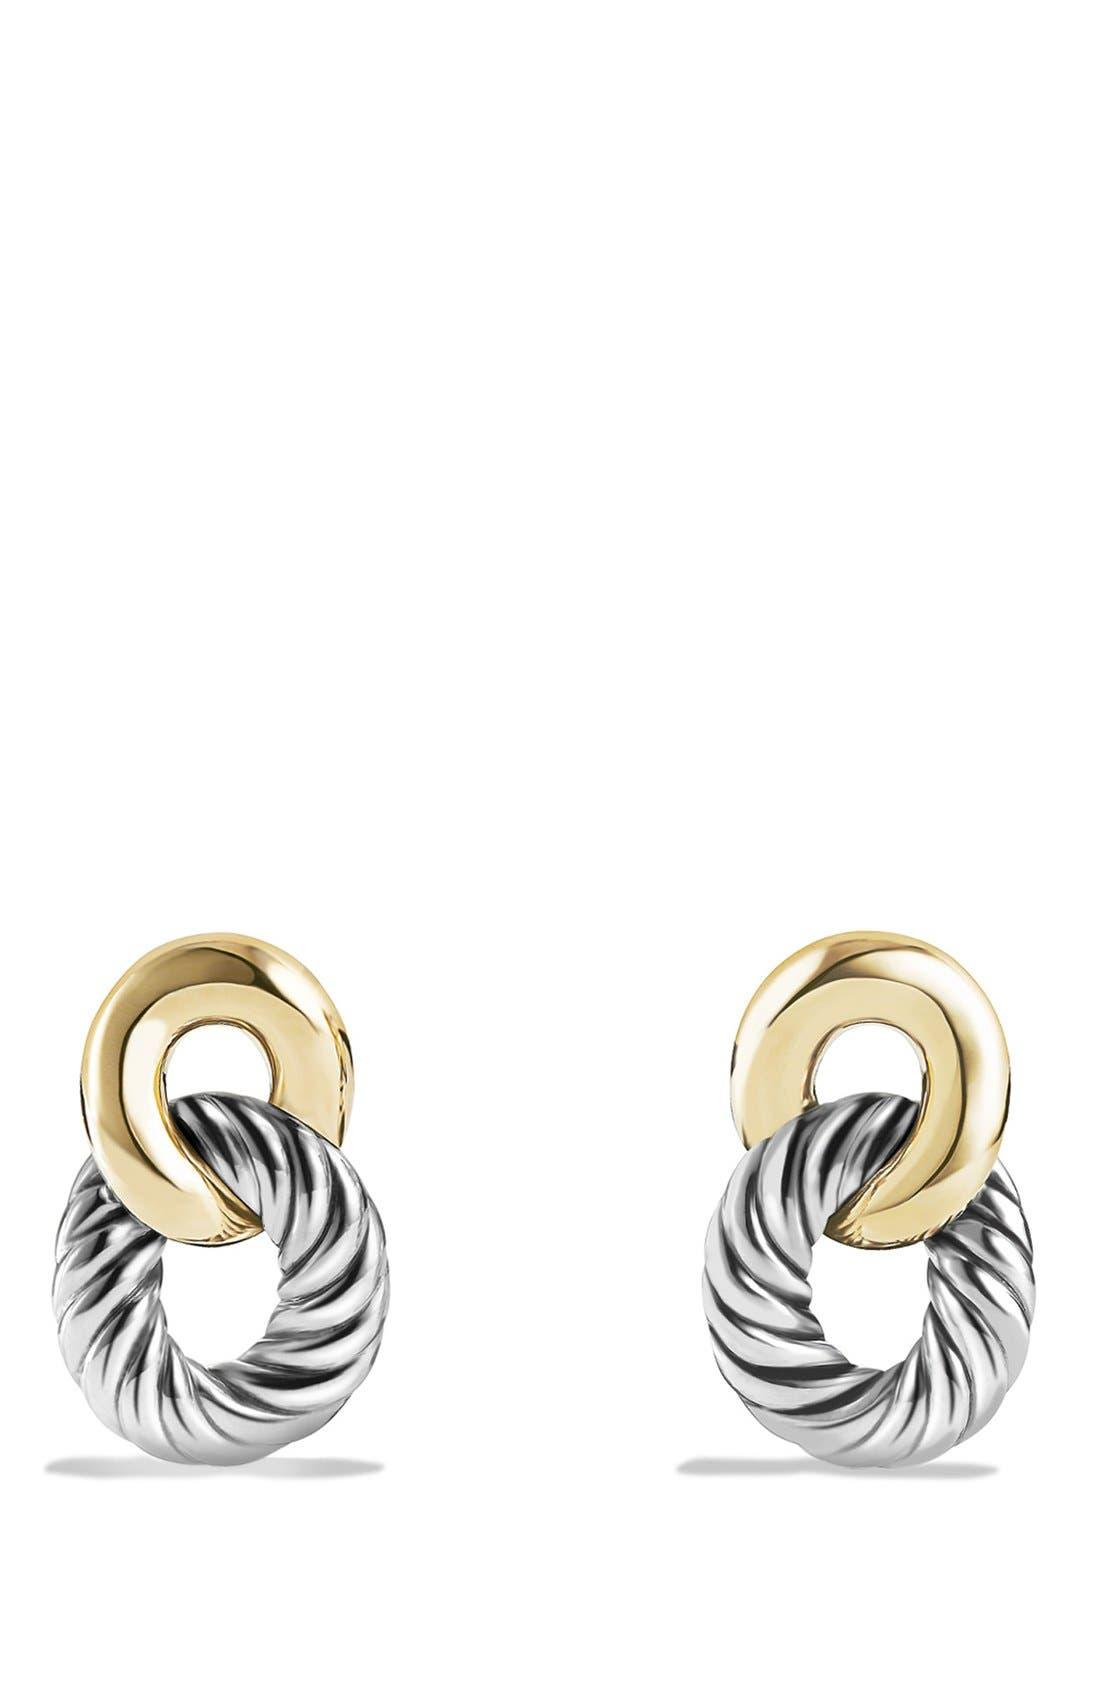 David Yurman'Belmont' Curb Link Drop Earrings with 18K Gold